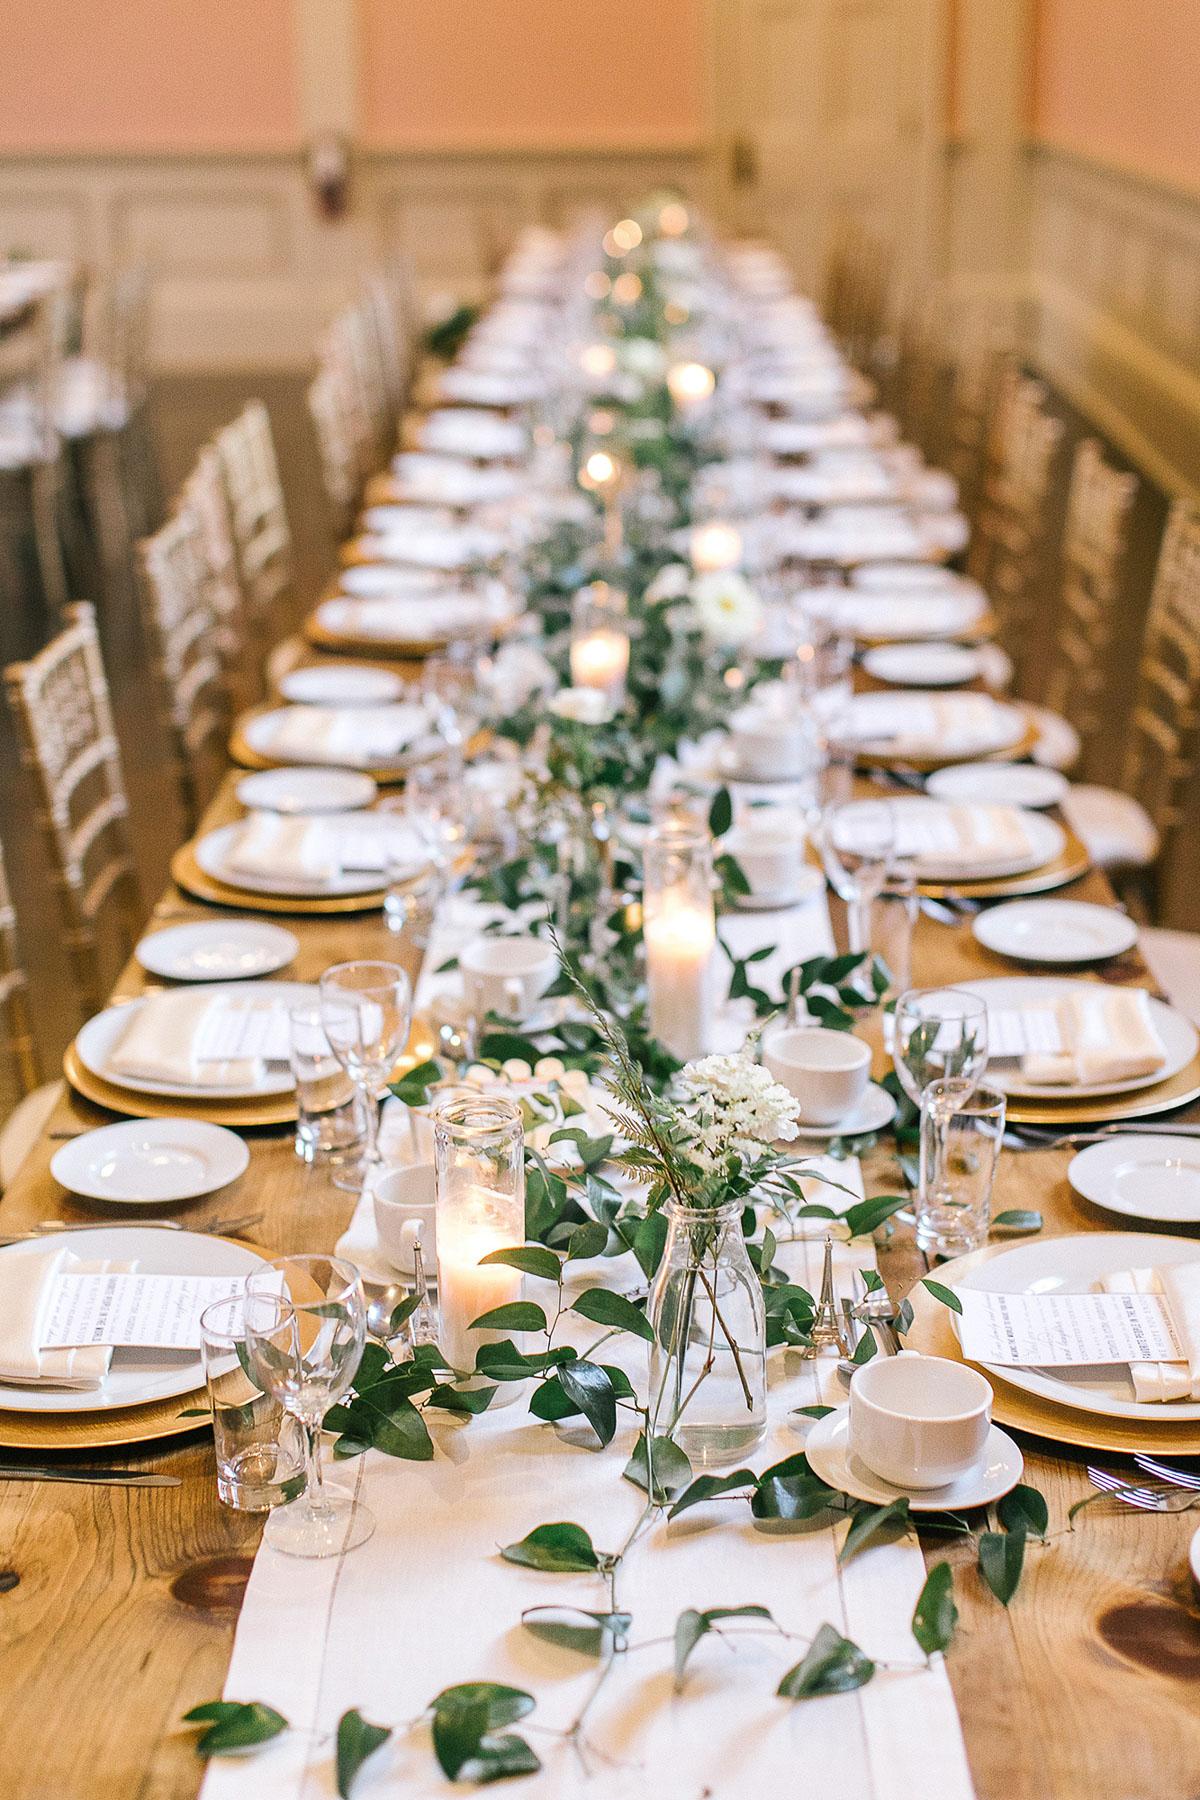 tamara-lockwood-photography-vineyard-bride-swish-list-the-old-courthouse-niagara-on-the-lake-wedding-59.jpg